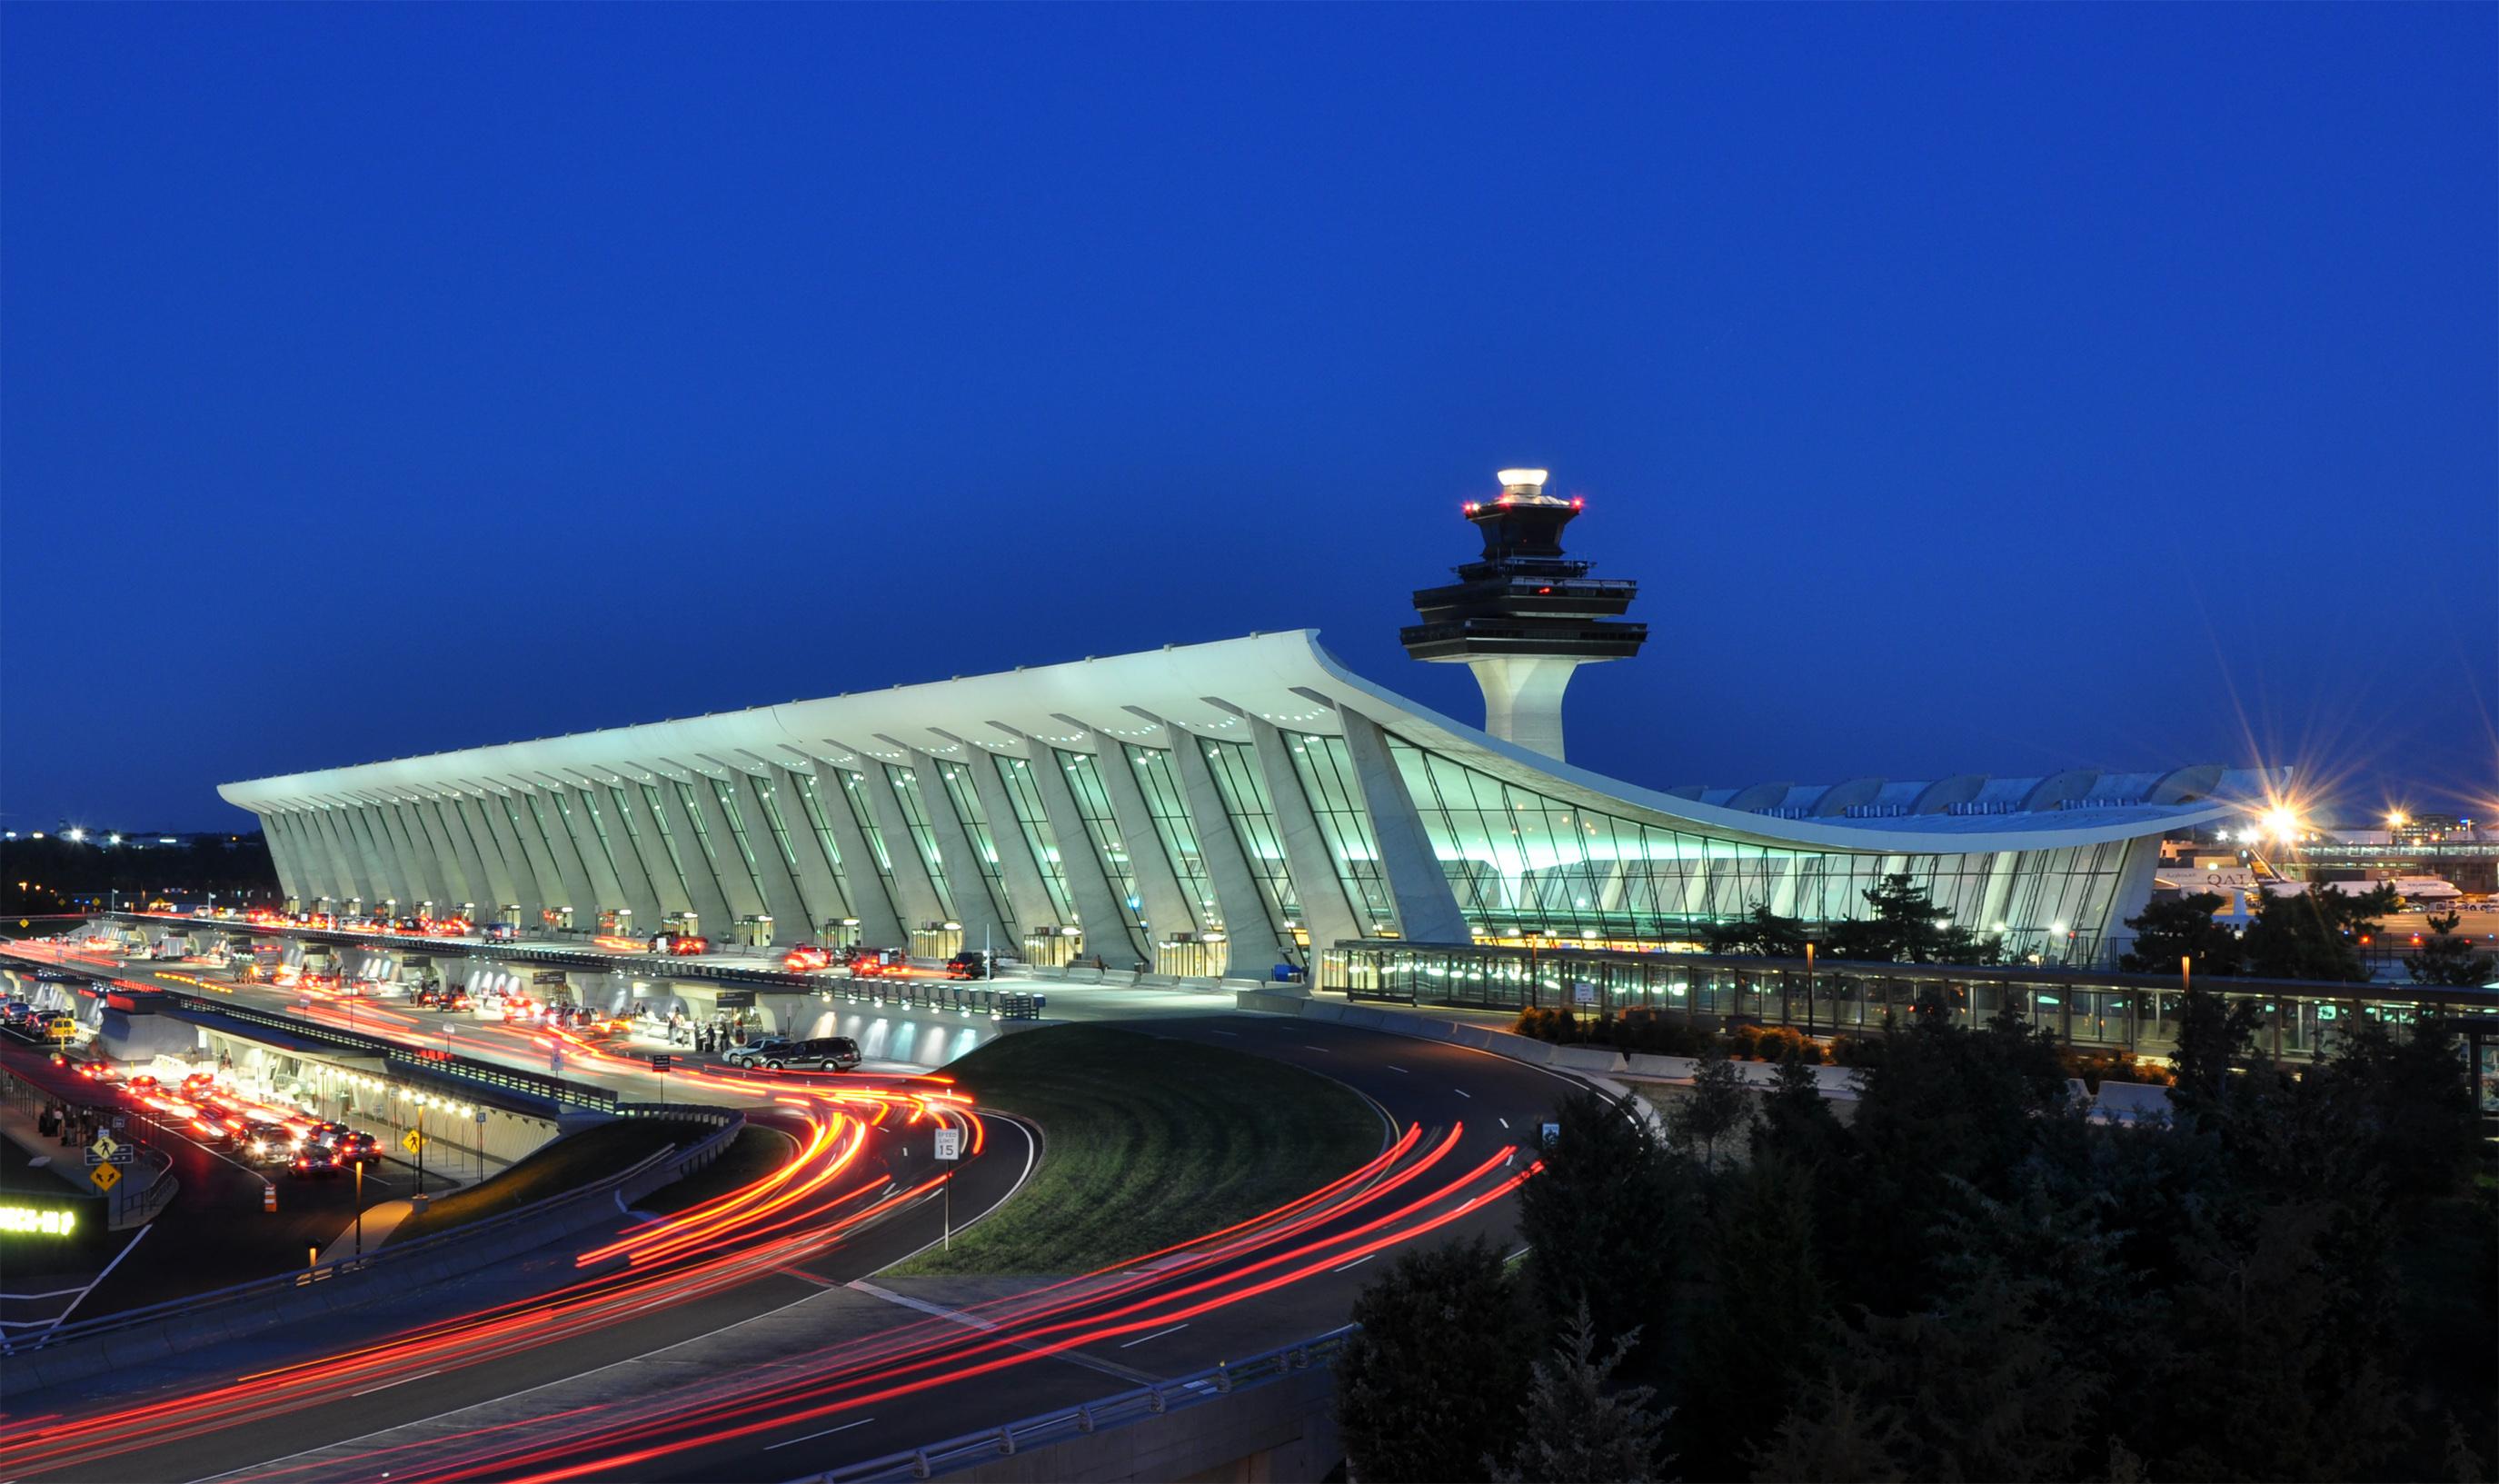 File:Washington Dulles International Airport at Dusk.jpg - Wikimedia ...